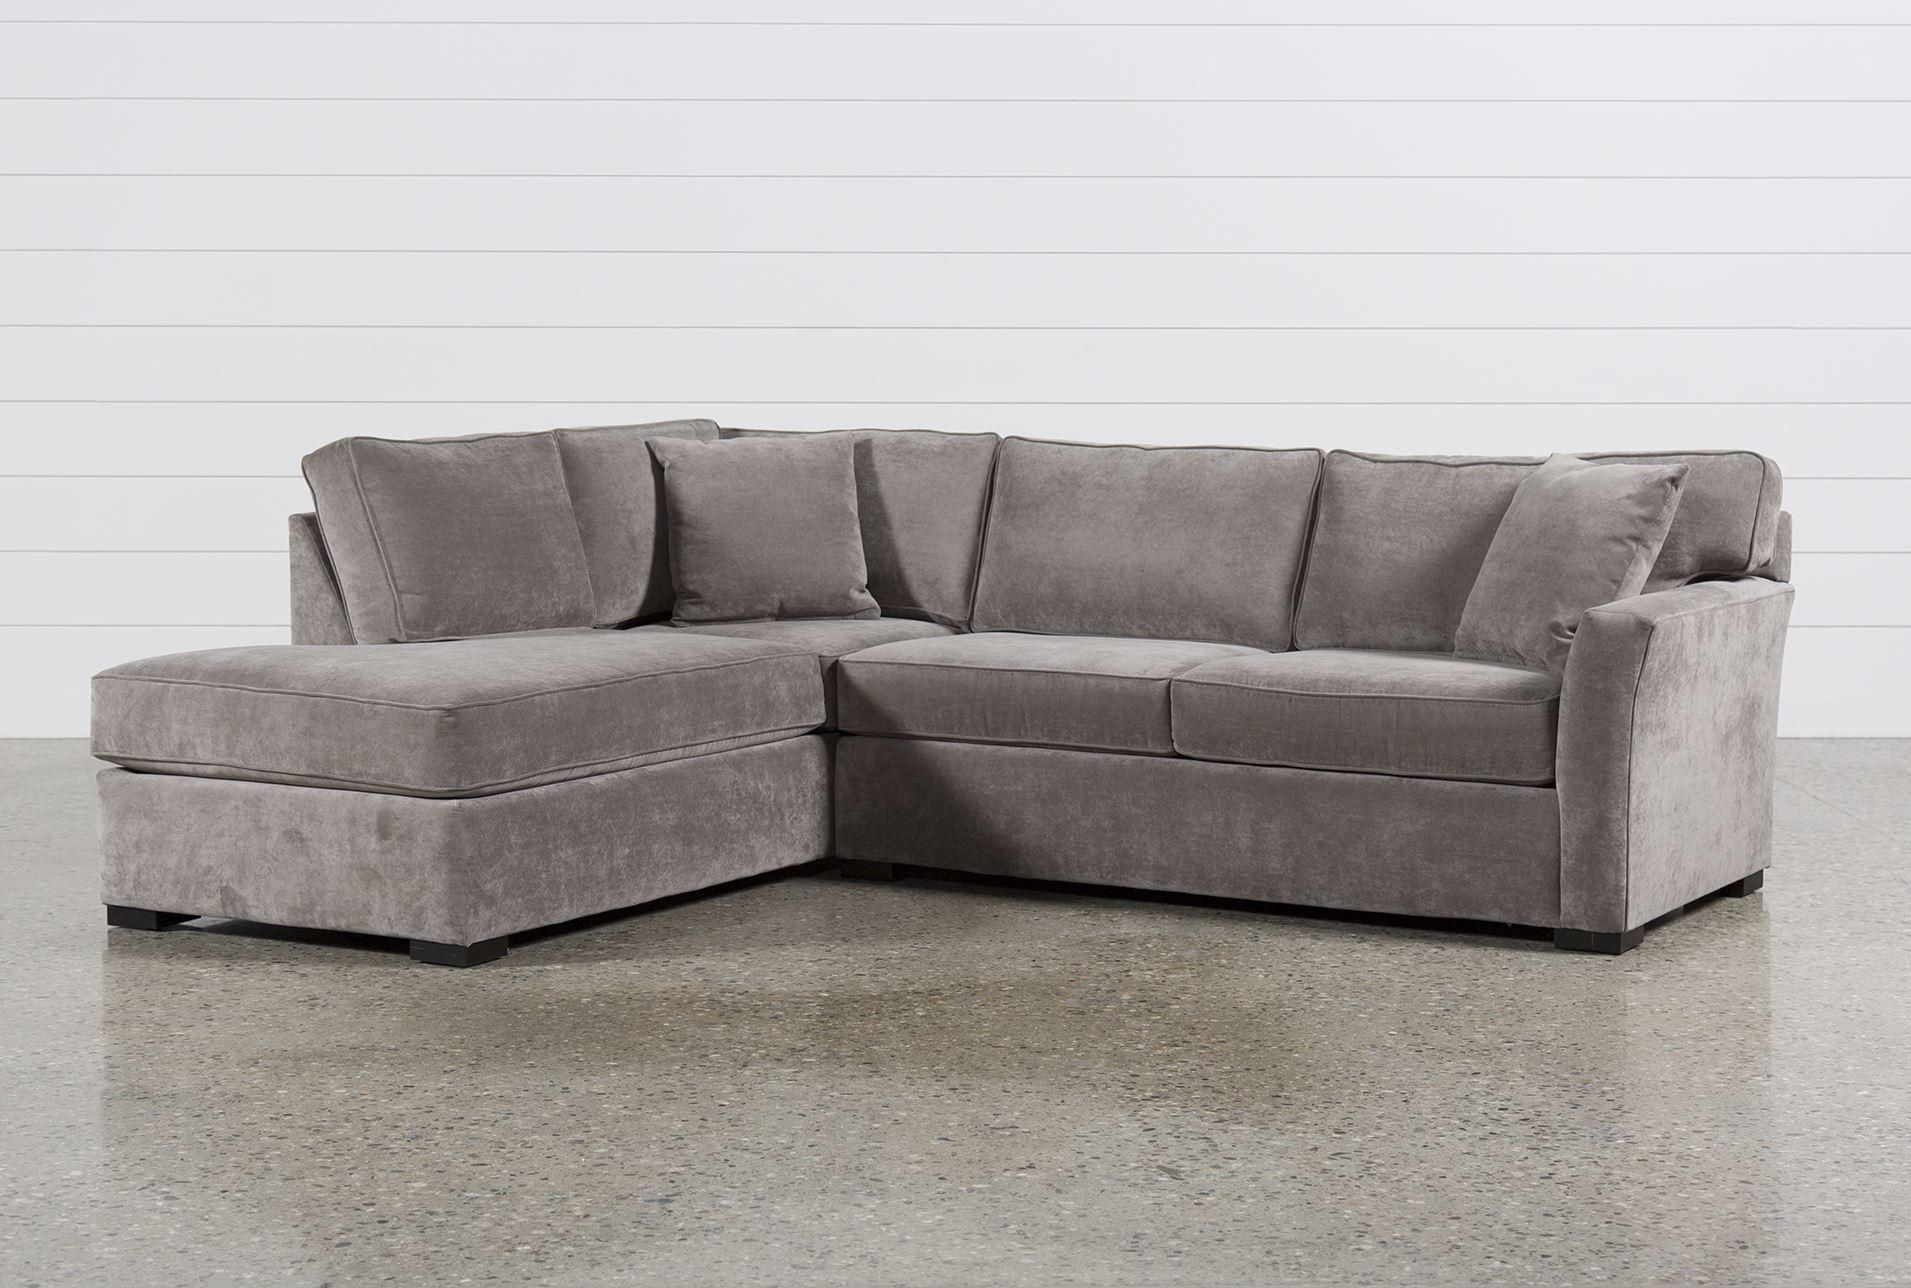 Sofas Center : Circlee Austin Sleeper Converitable Beds Sofa Throughout Austin Sleeper Sofas (Image 13 of 20)